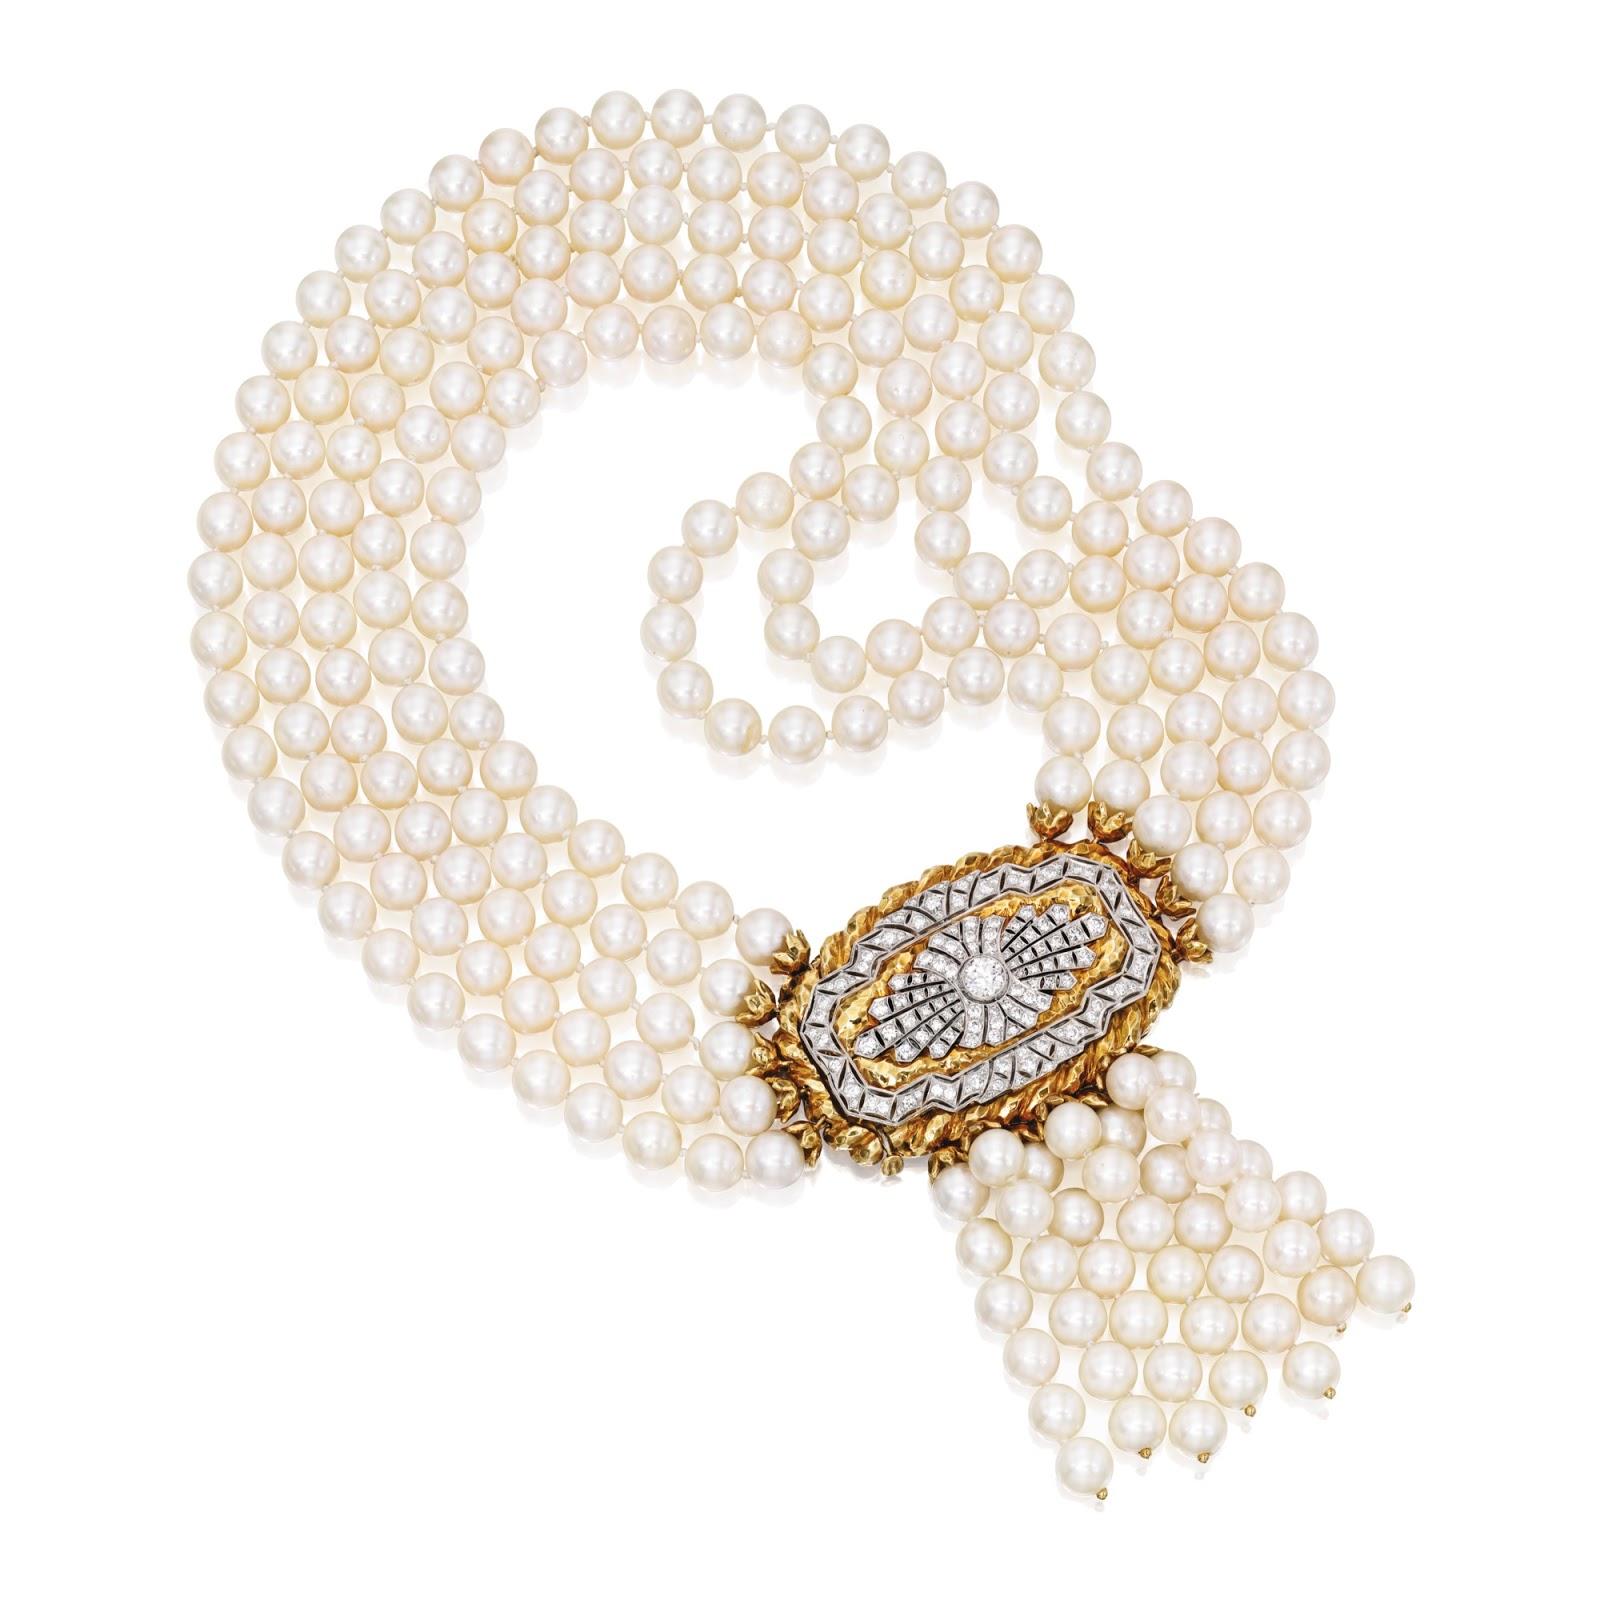 dcecc7f3efa9a Marie Poutine's Jewels & Royals: March 2015